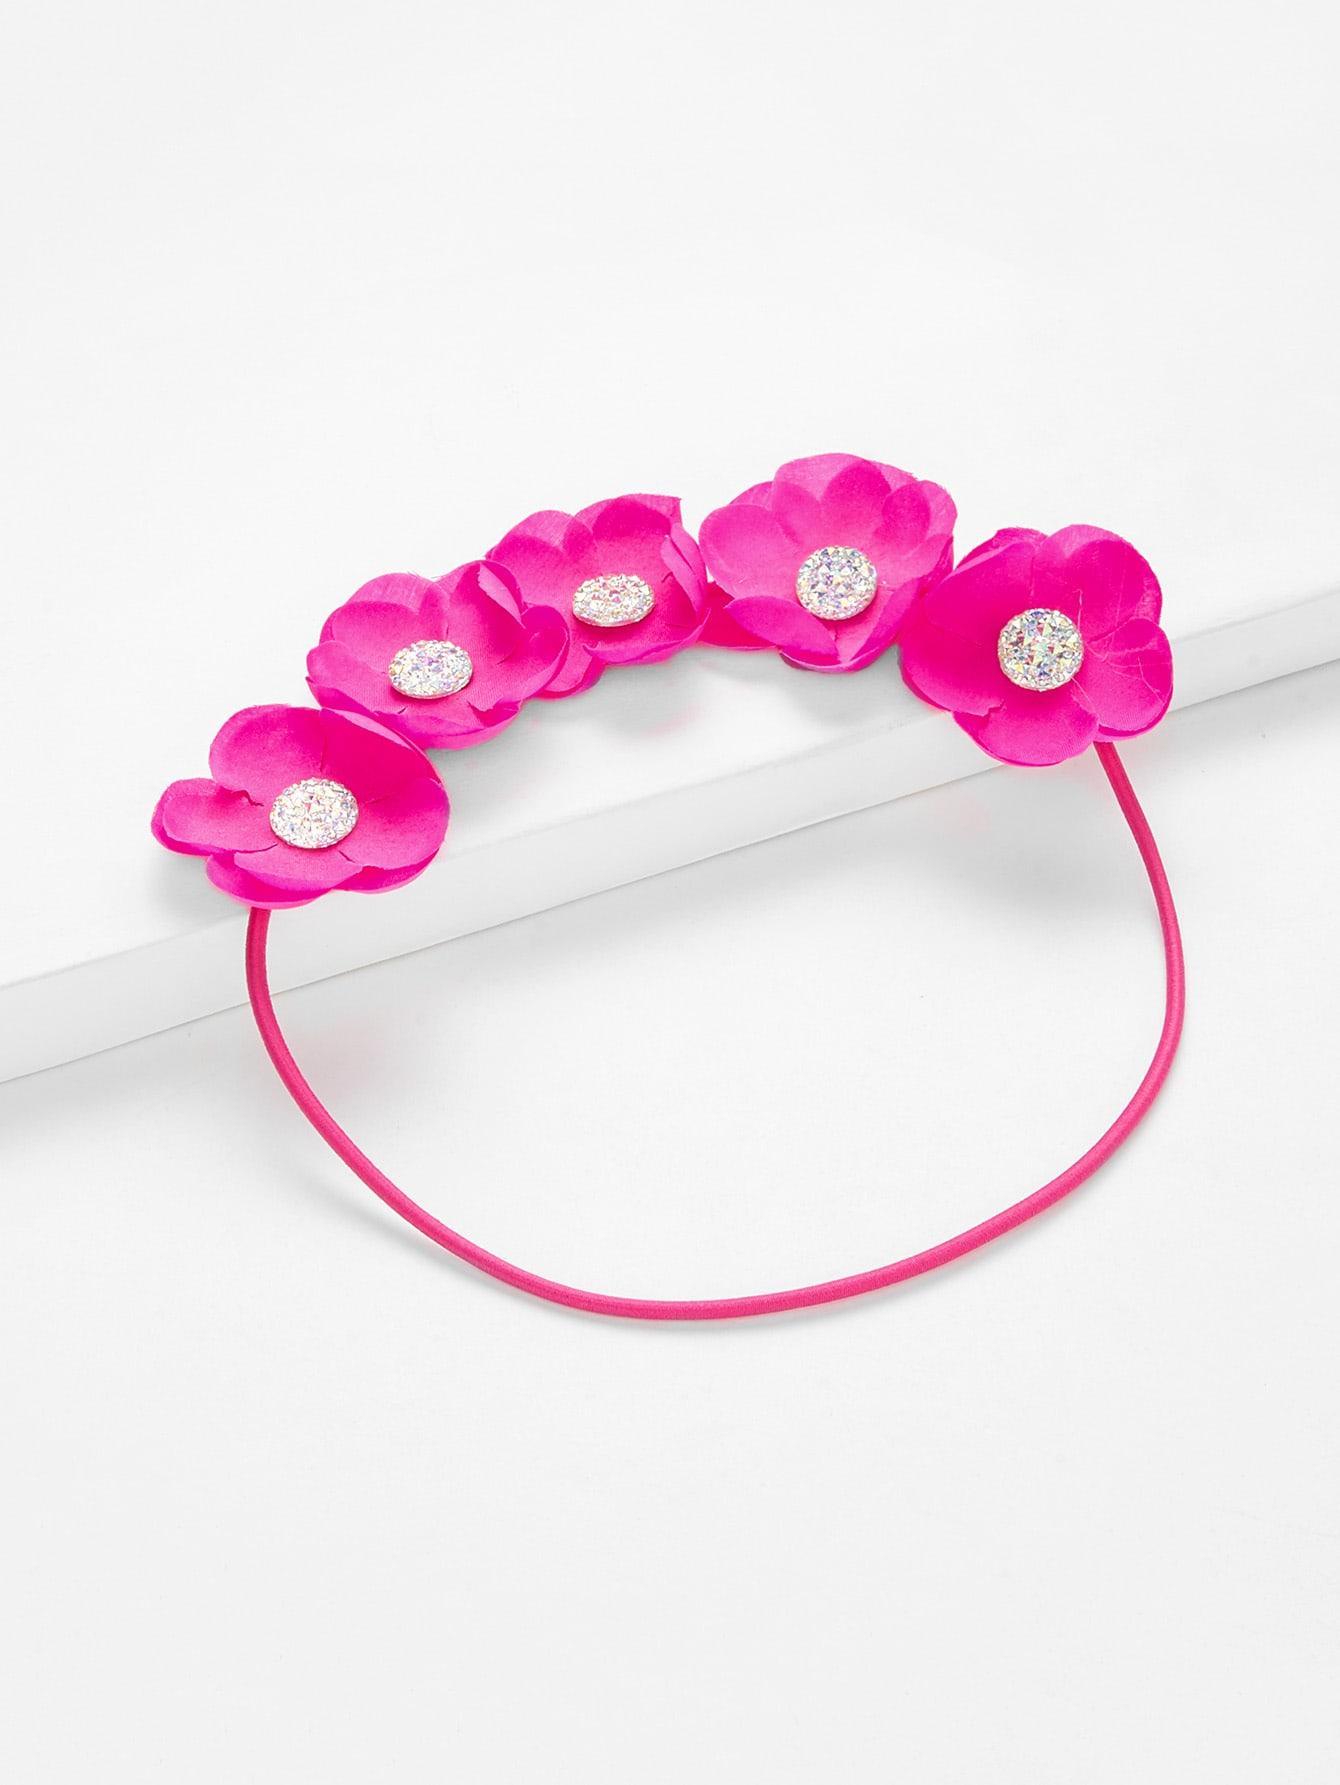 Rhinestone Flower Decorated Kids Headband rhinestone decorated kids hair clip 4pcs